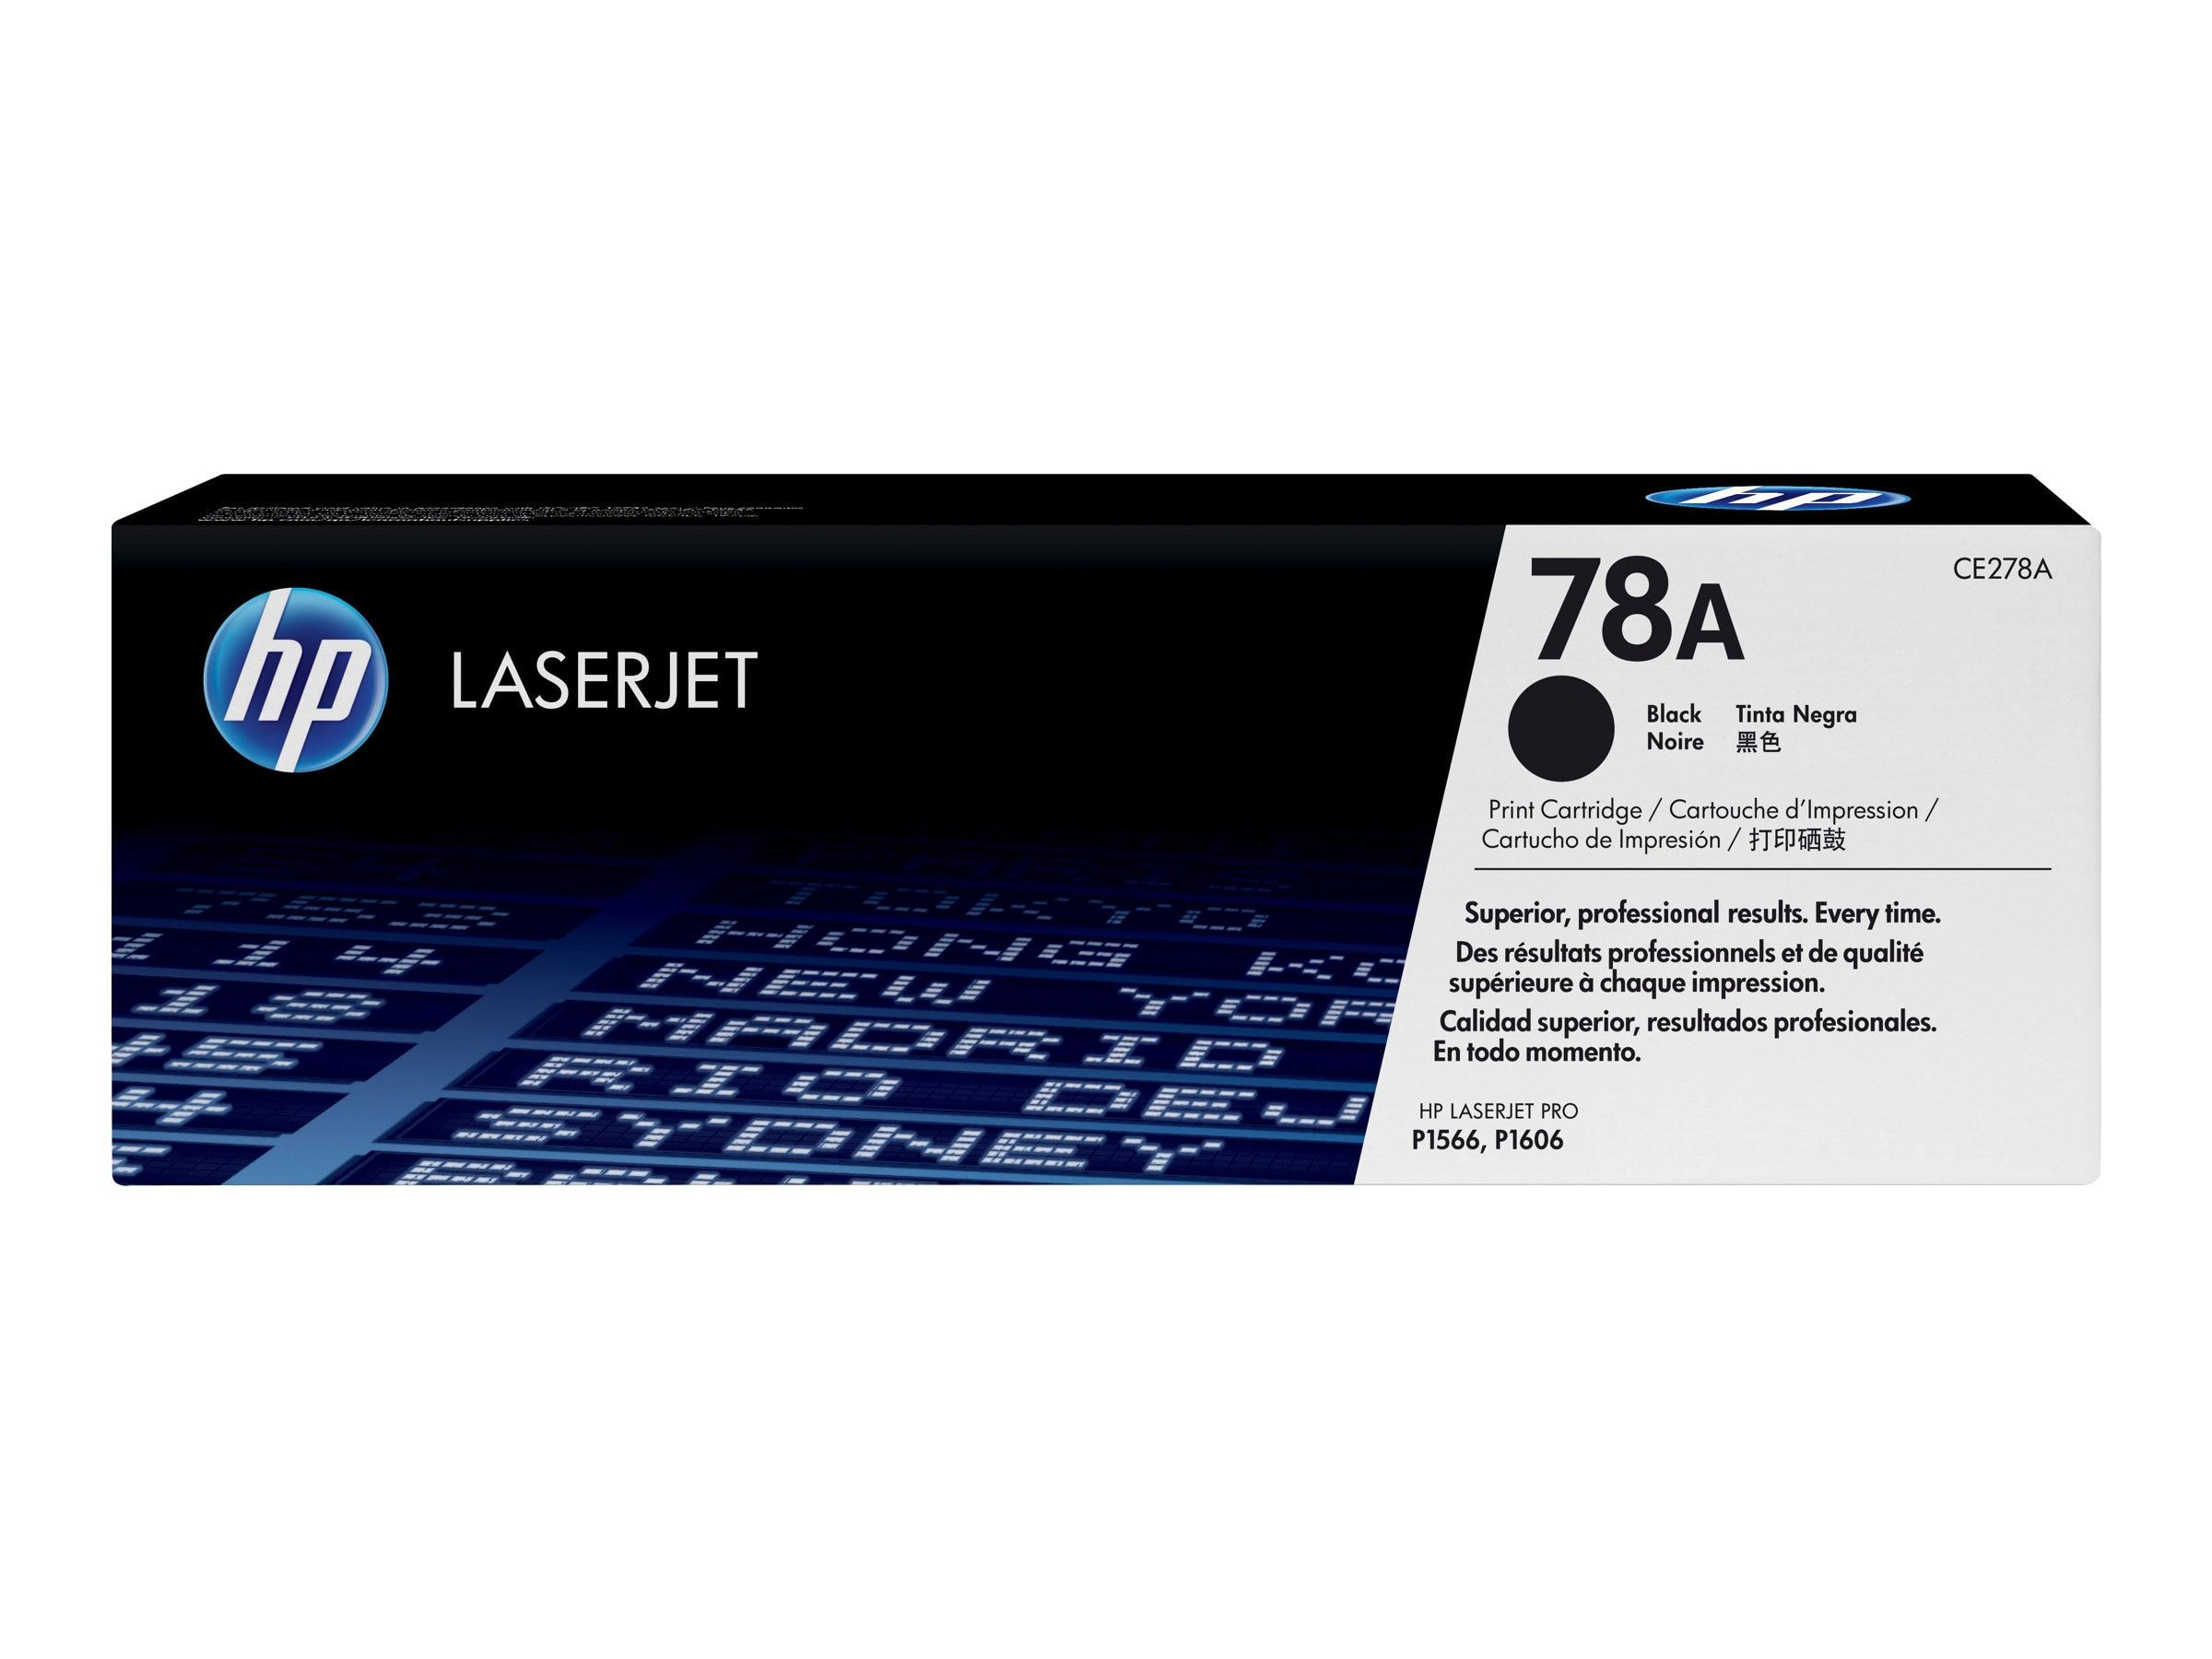 HP 78A (CE278A) Black Original LaserJet Toner Cartridge for HP LaserJet Pro M1536dnf & P1606dn, CE278A, 10983080, Toner and Imaging Components